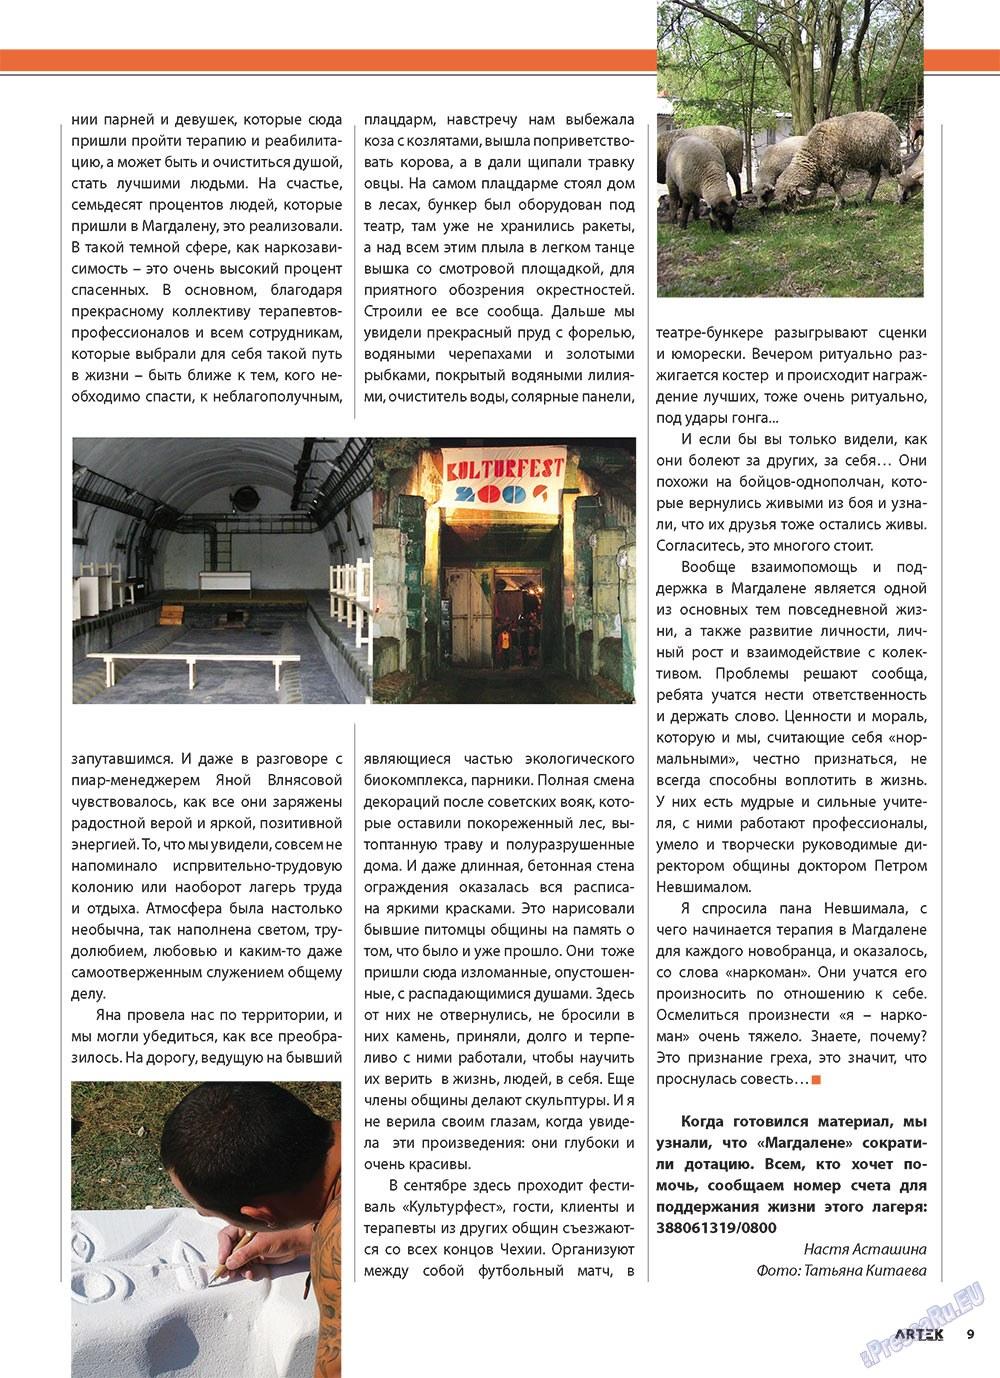 Артек (журнал). 2010 год, номер 4, стр. 11